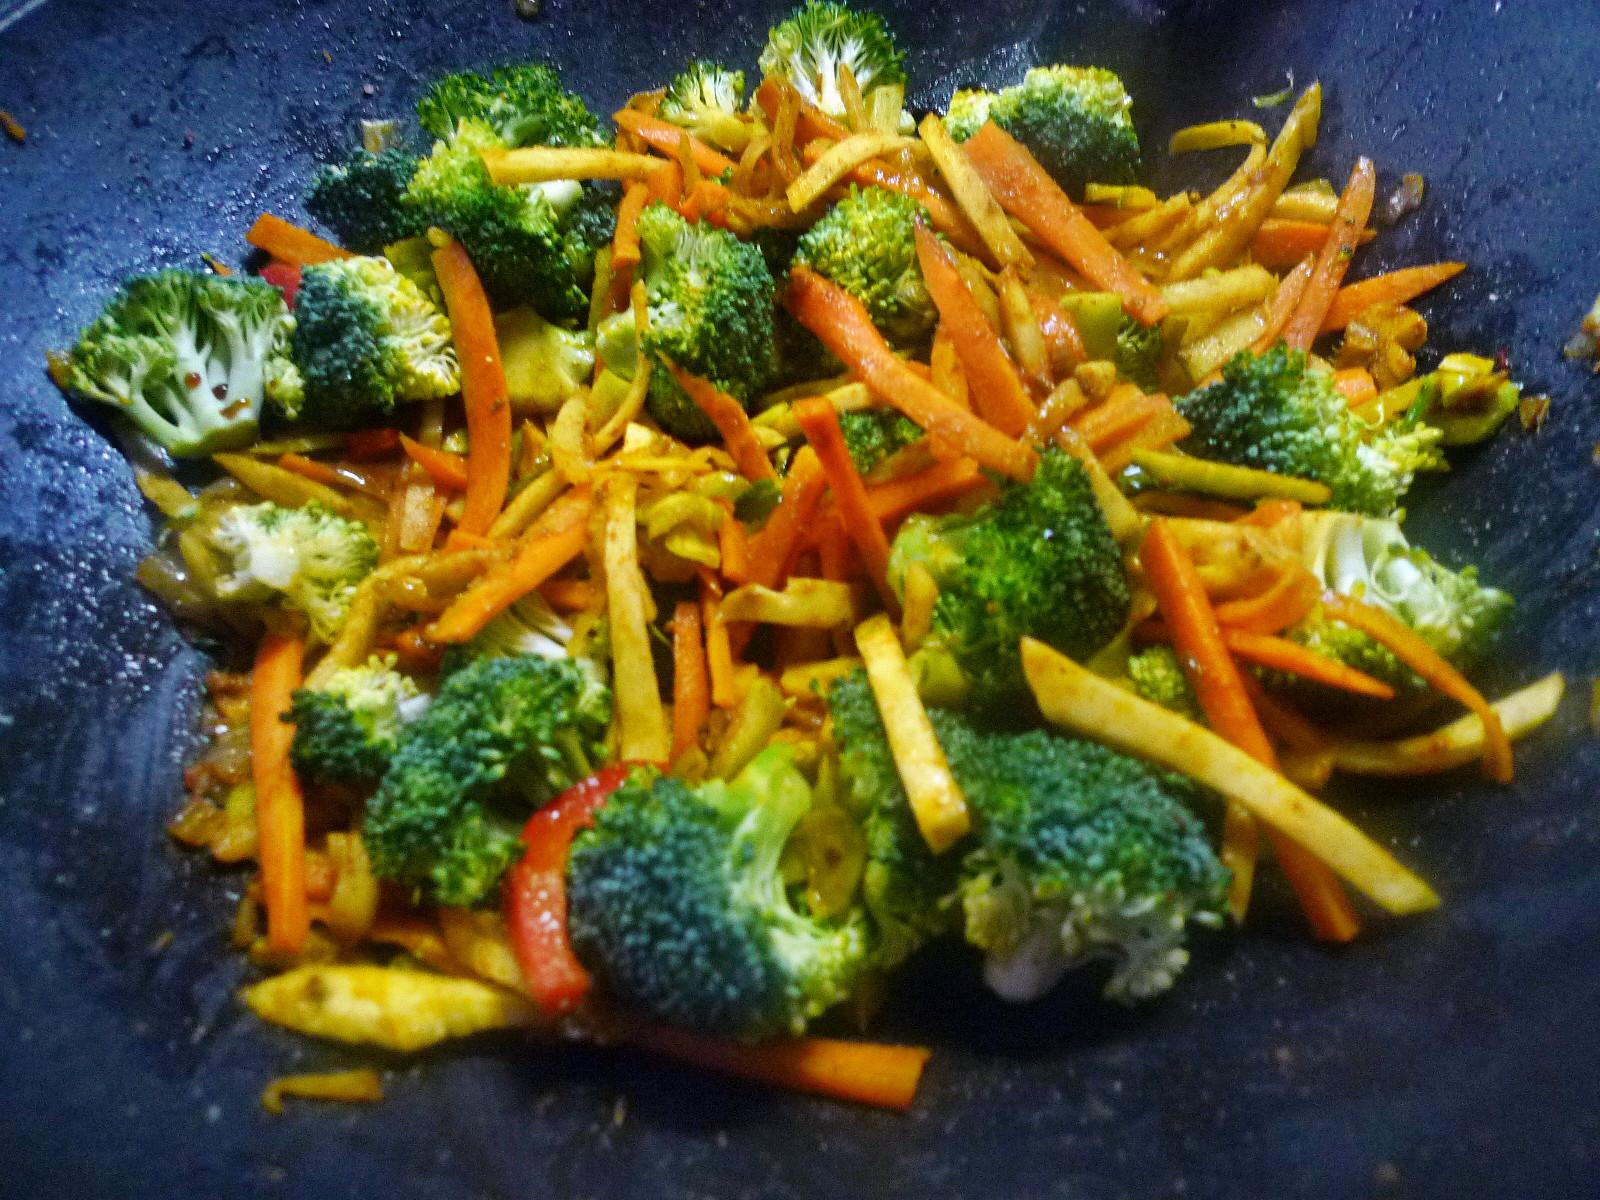 Wokgemüse mit Omlette - 23.11.14   (24)